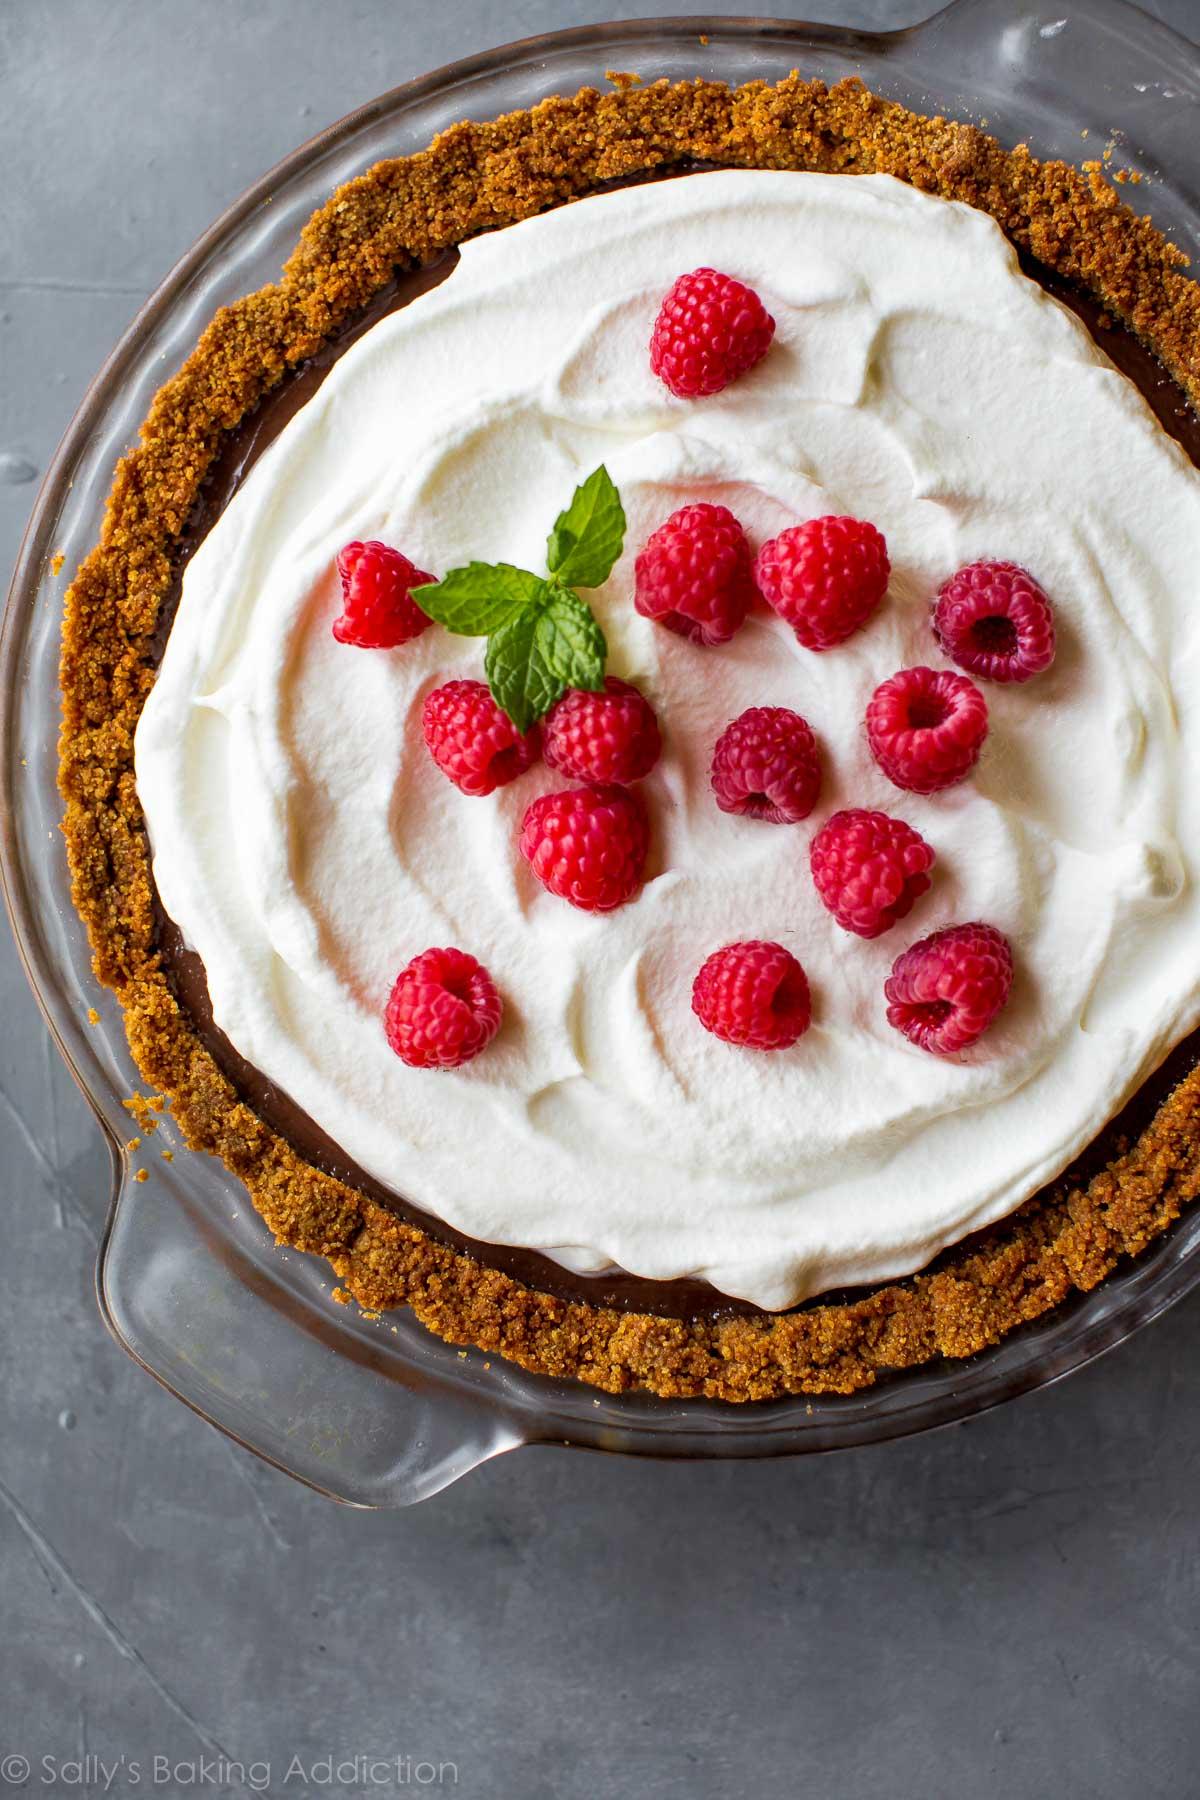 Homemade Chocolate Pudding Pie - Sallys Baking Addiction